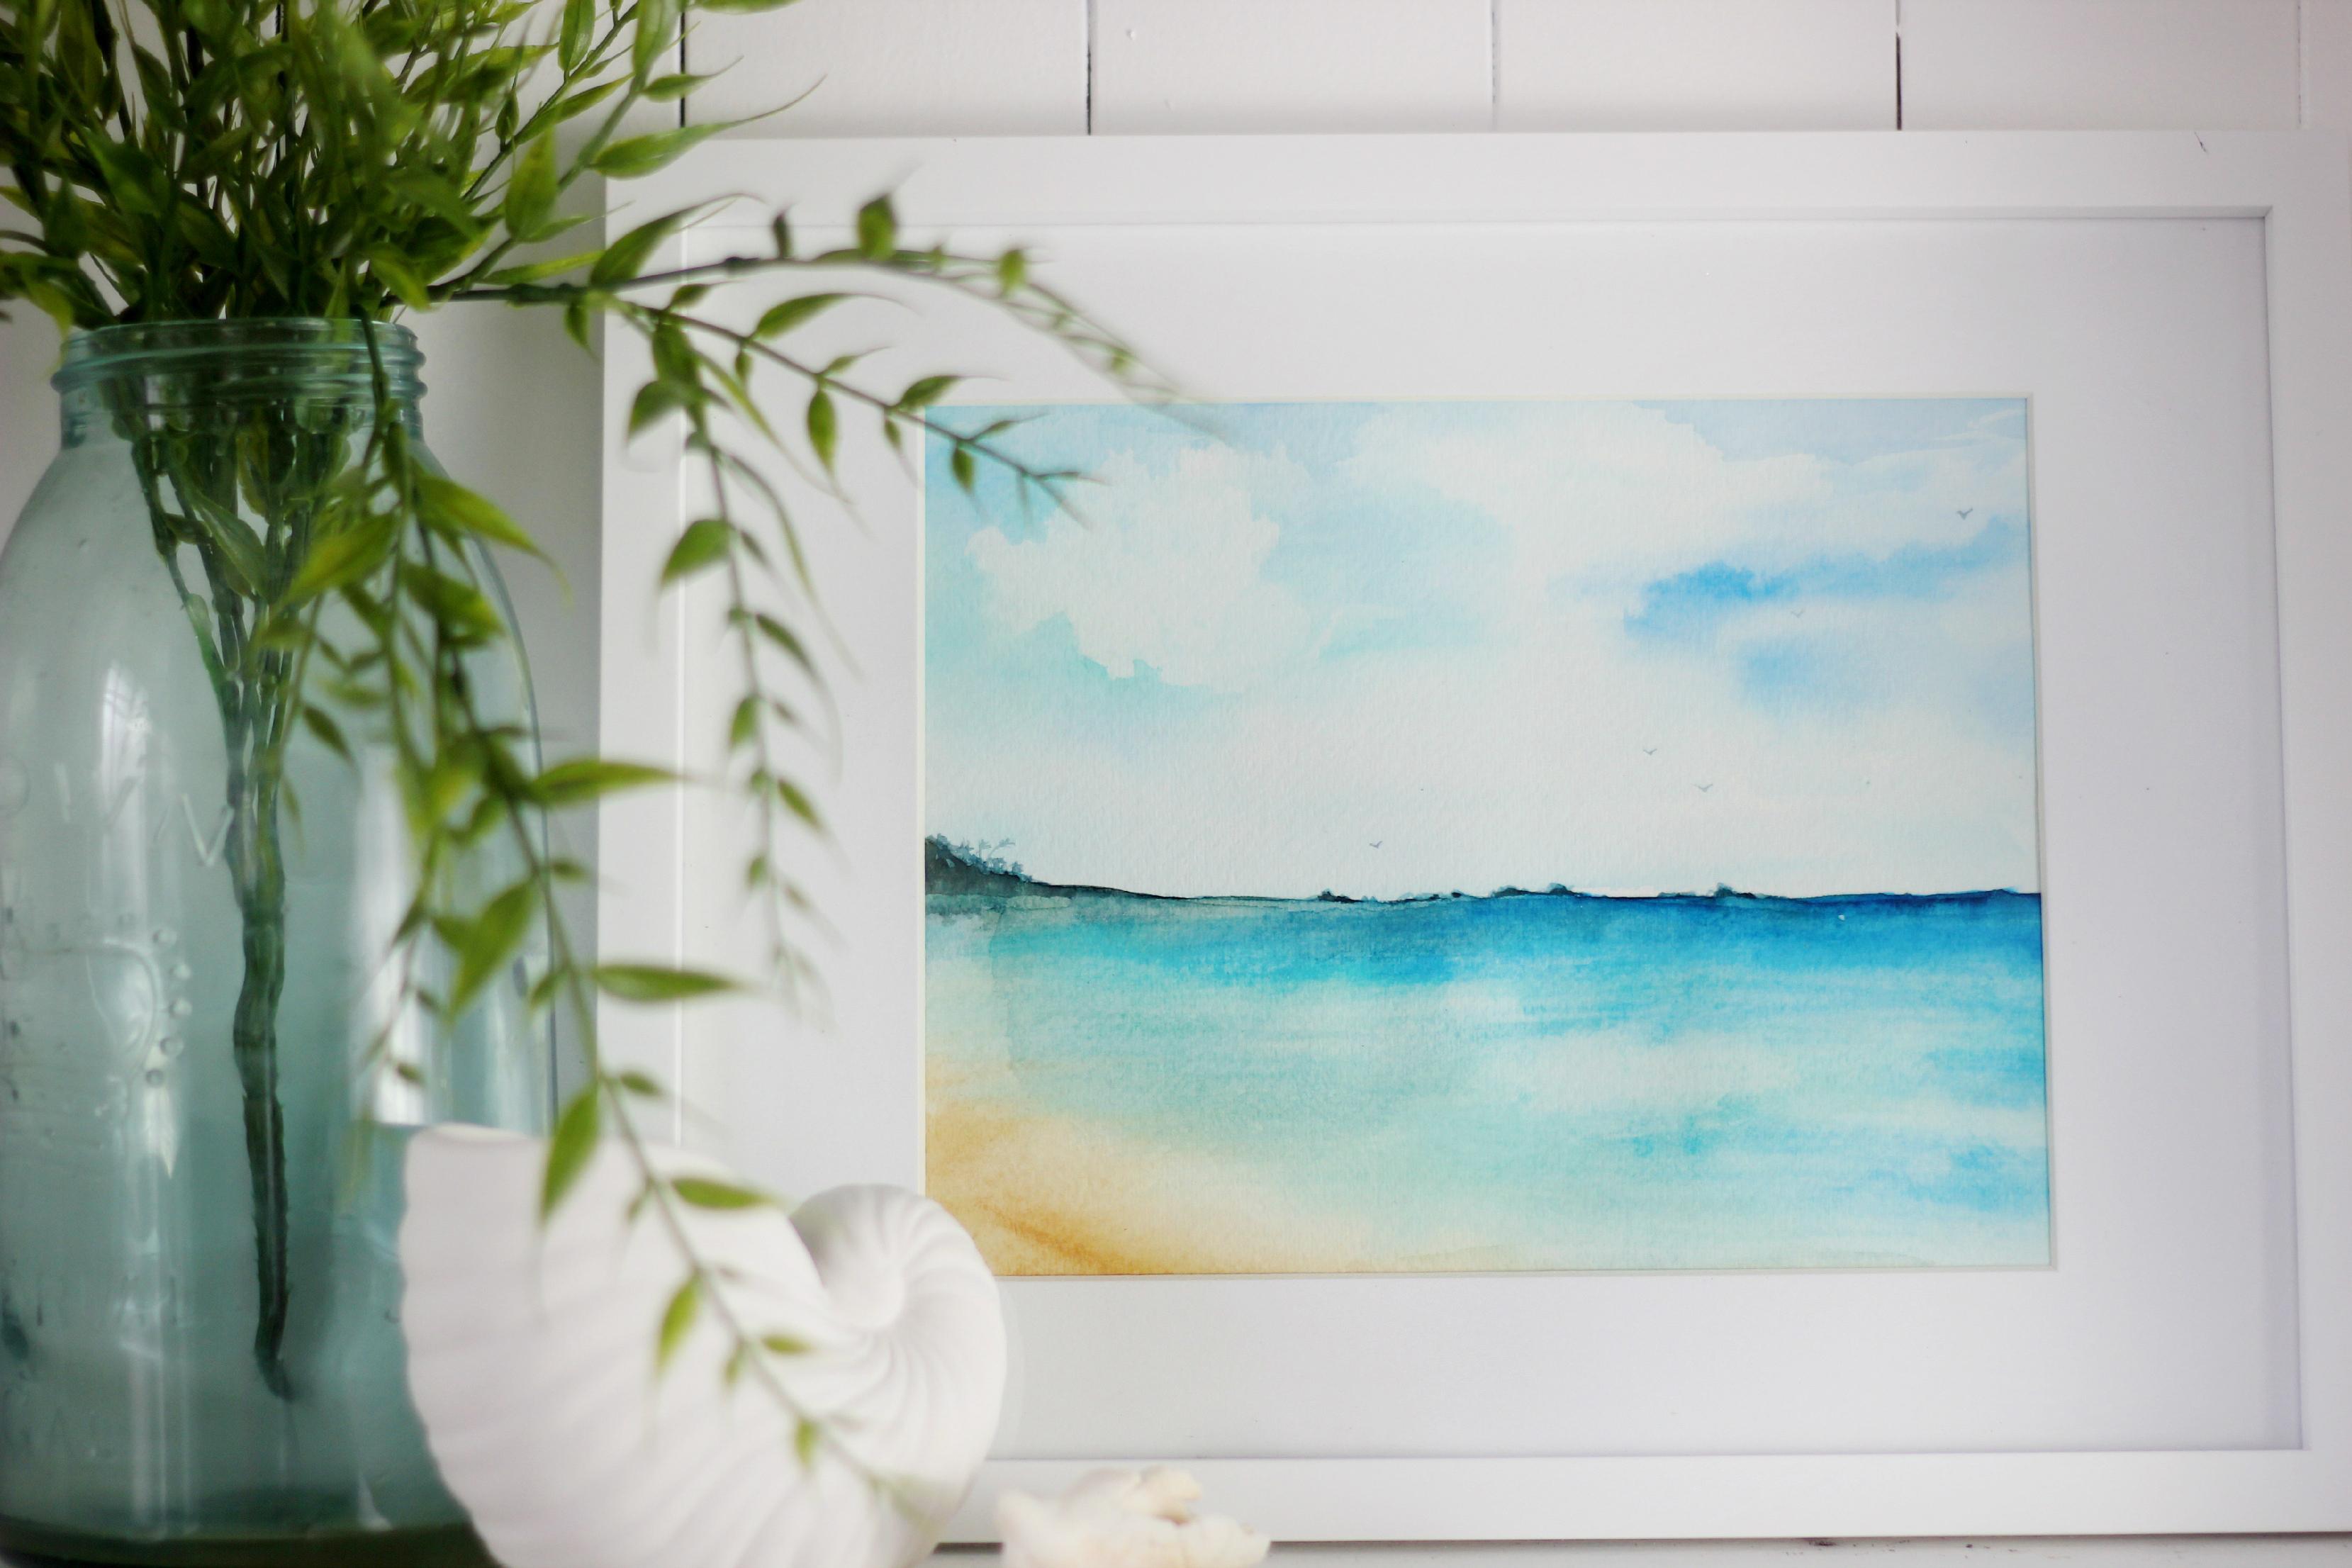 Beginner Beach Sunset Watercolor Painting Beach Watercolor Ocean Painting Sunrise Painting Sunset Painting Easy Sunset Nature Beach Sunset Painting Sunset Painting Seascape Paintings On Canvas Ocean Beach Waves Original Acrylic